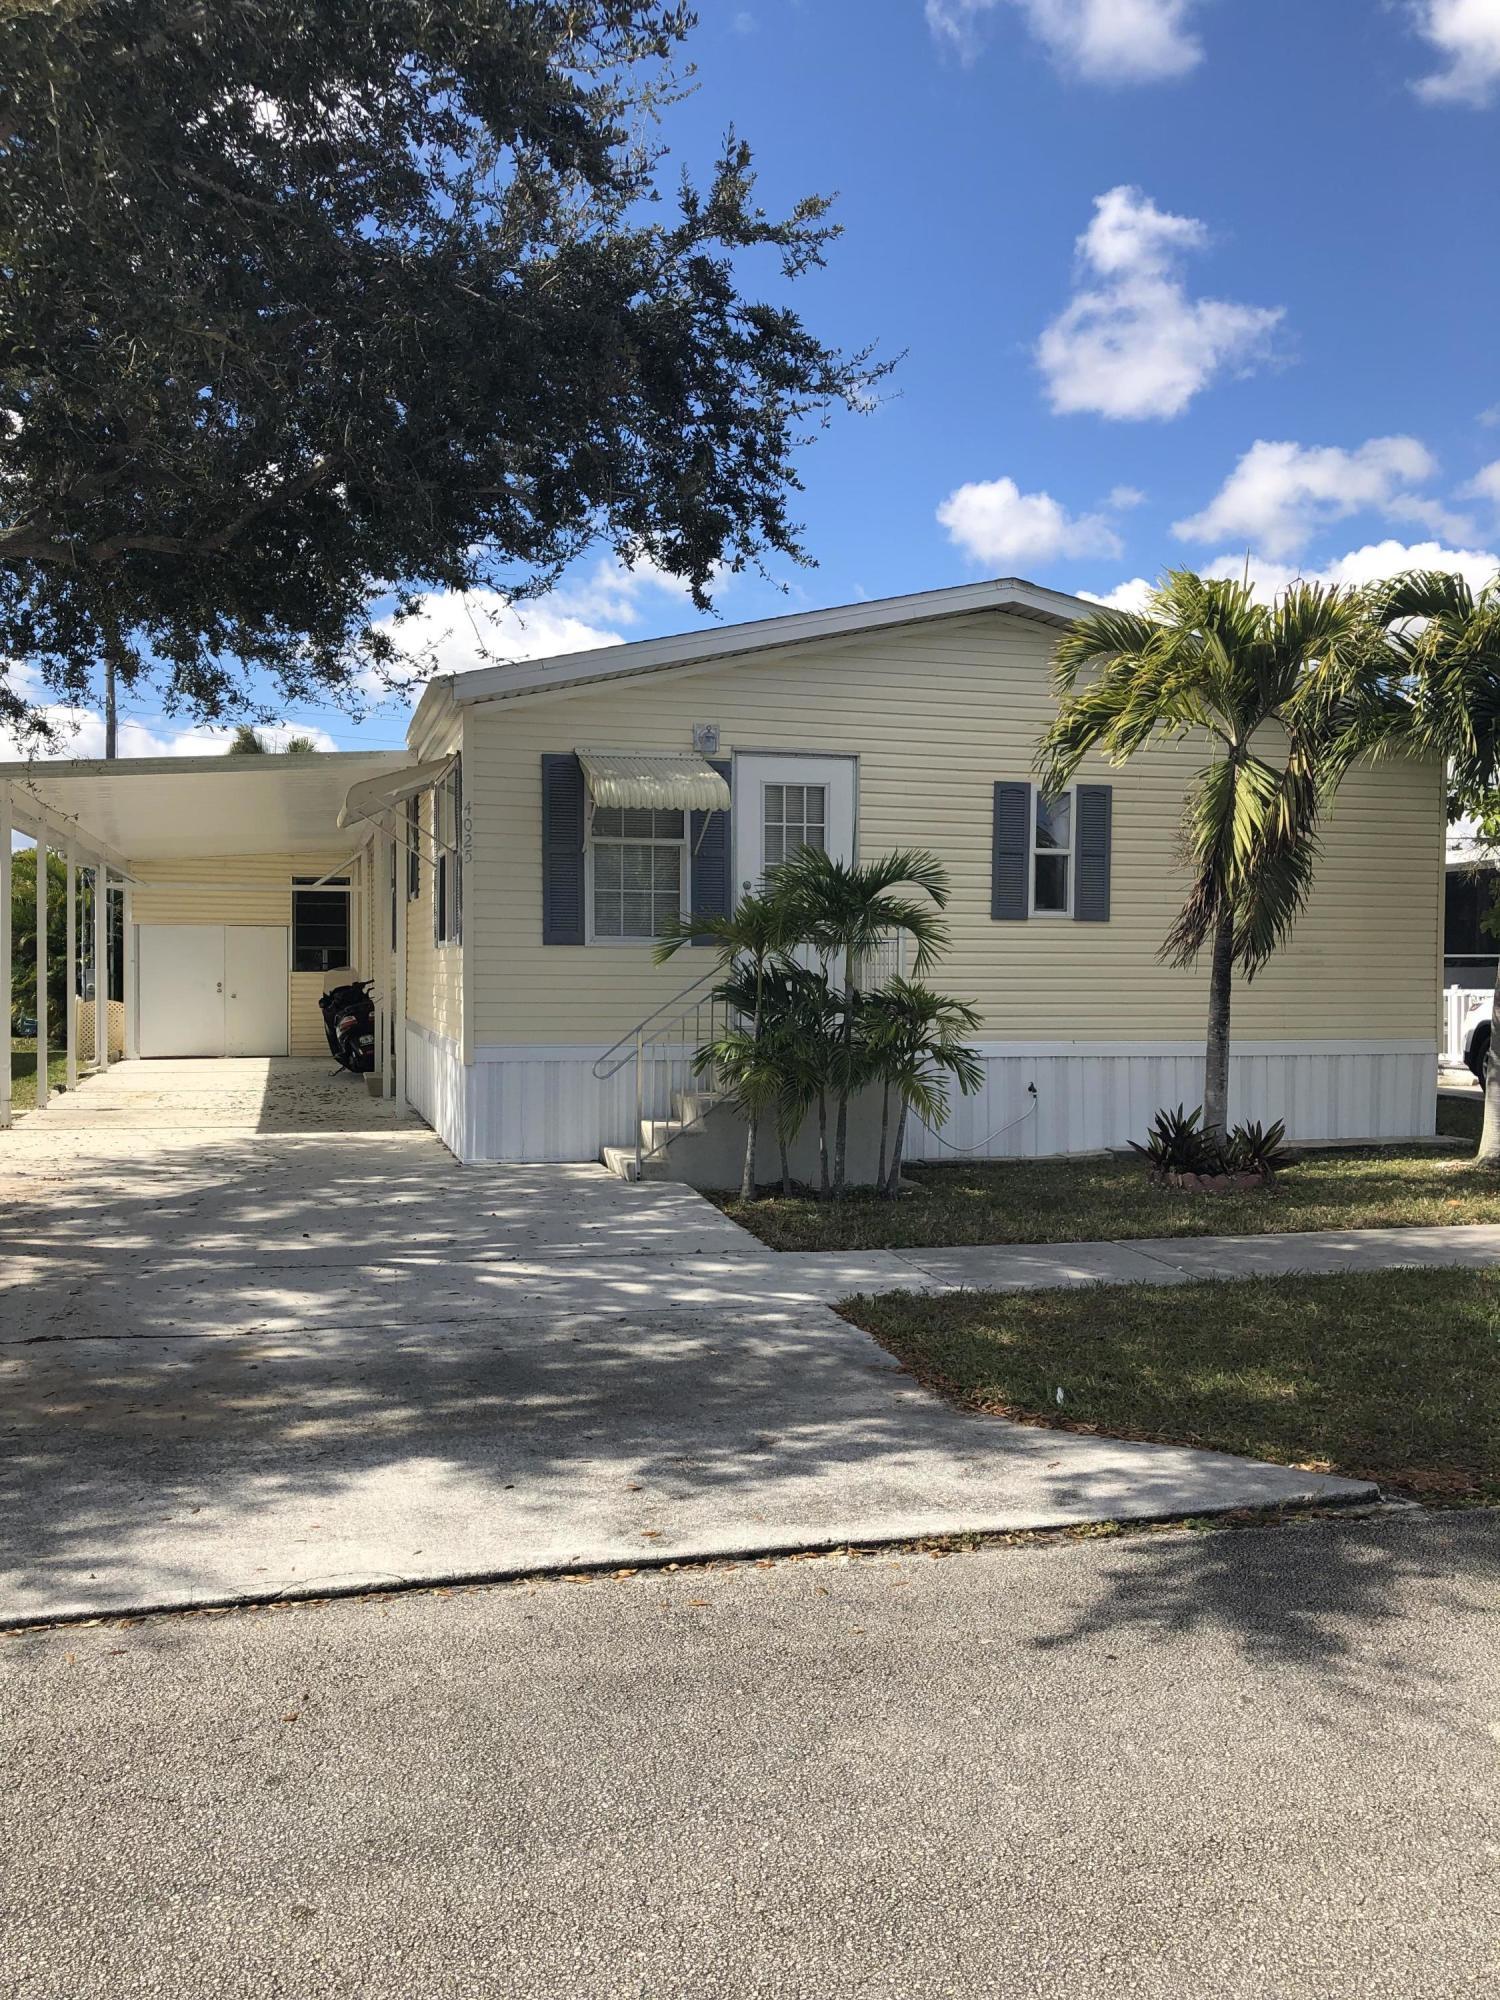 NORTHERN PINES MOBILE HOME PARK 3 home 4025 Bougainvillea Road Boynton Beach FL 33436